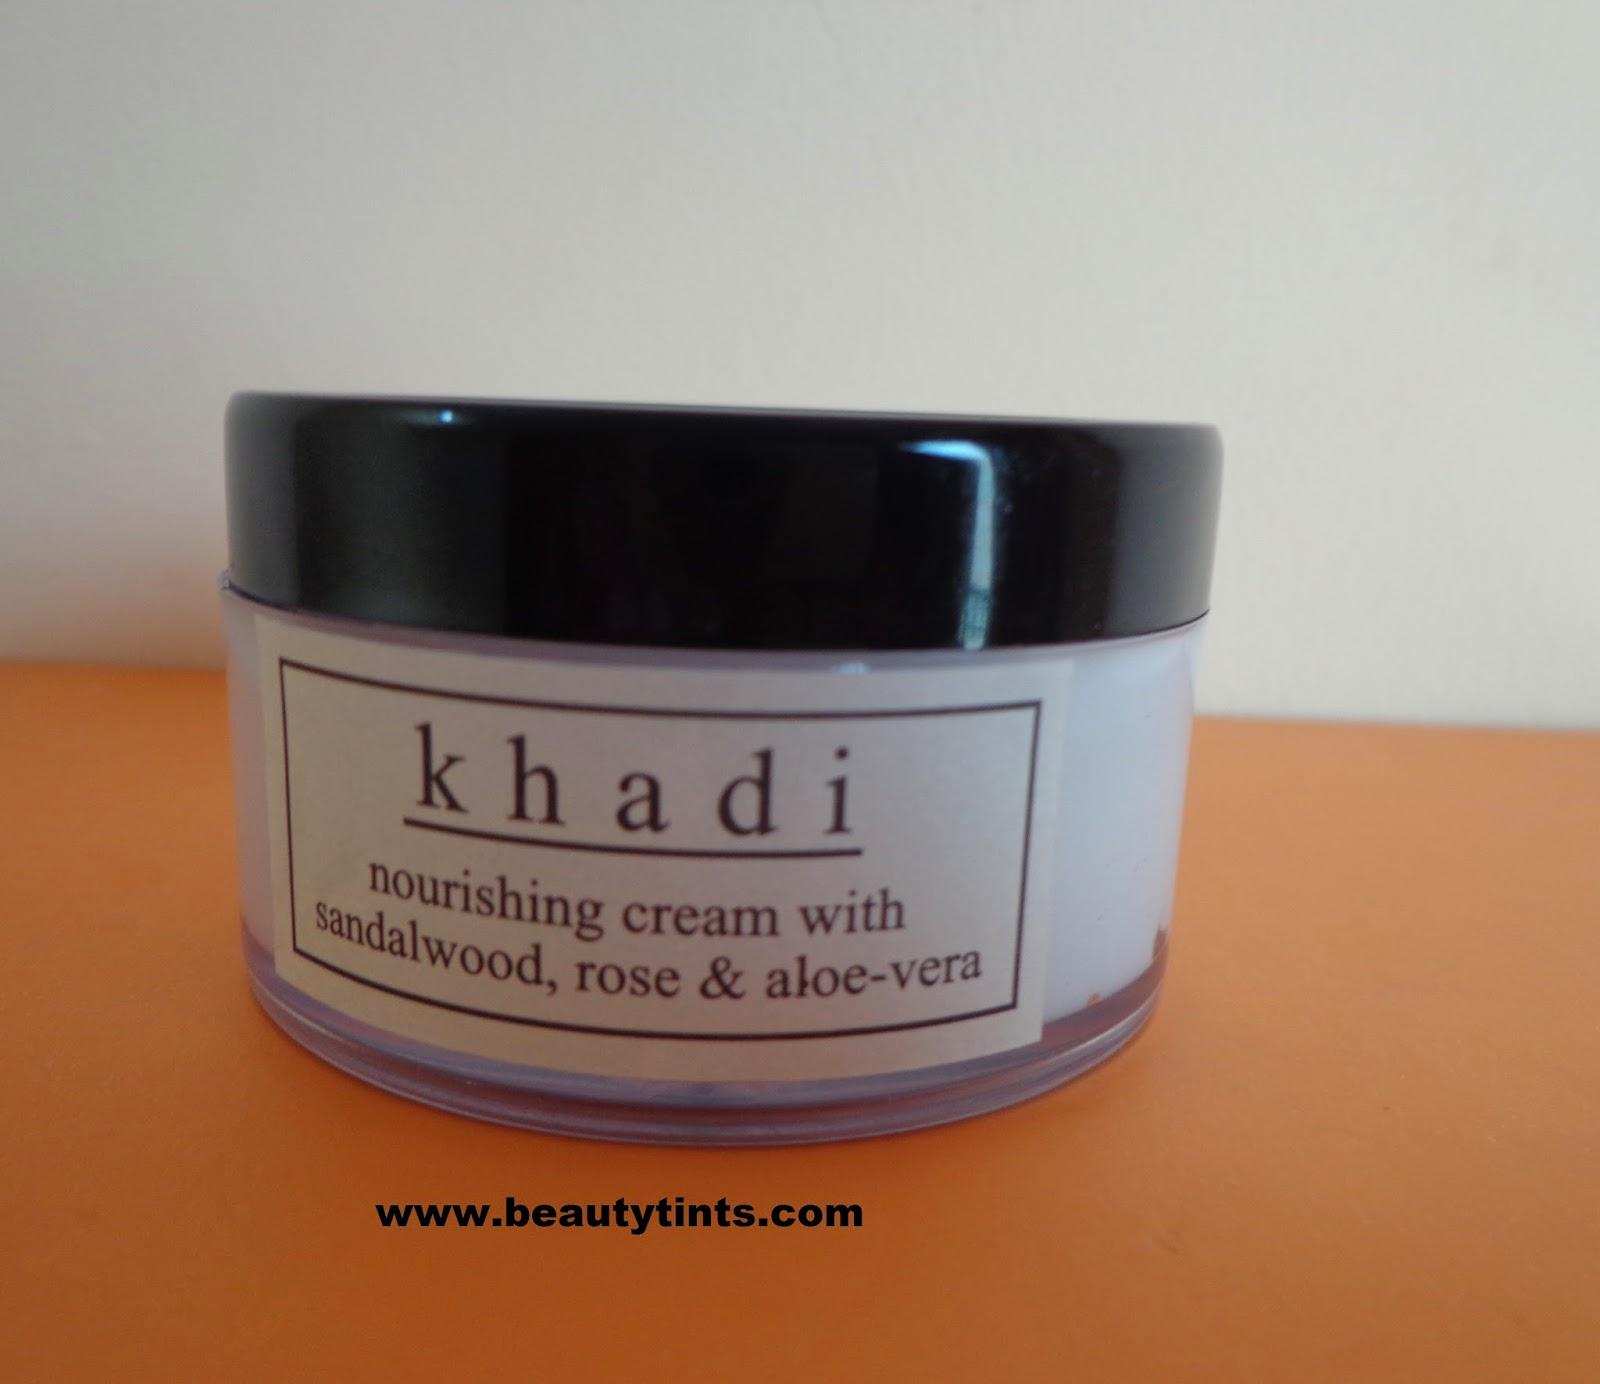 Khadi Sandal & Olive Nourishing Cream - 50 ml by Khadi Natural BqQ7eo